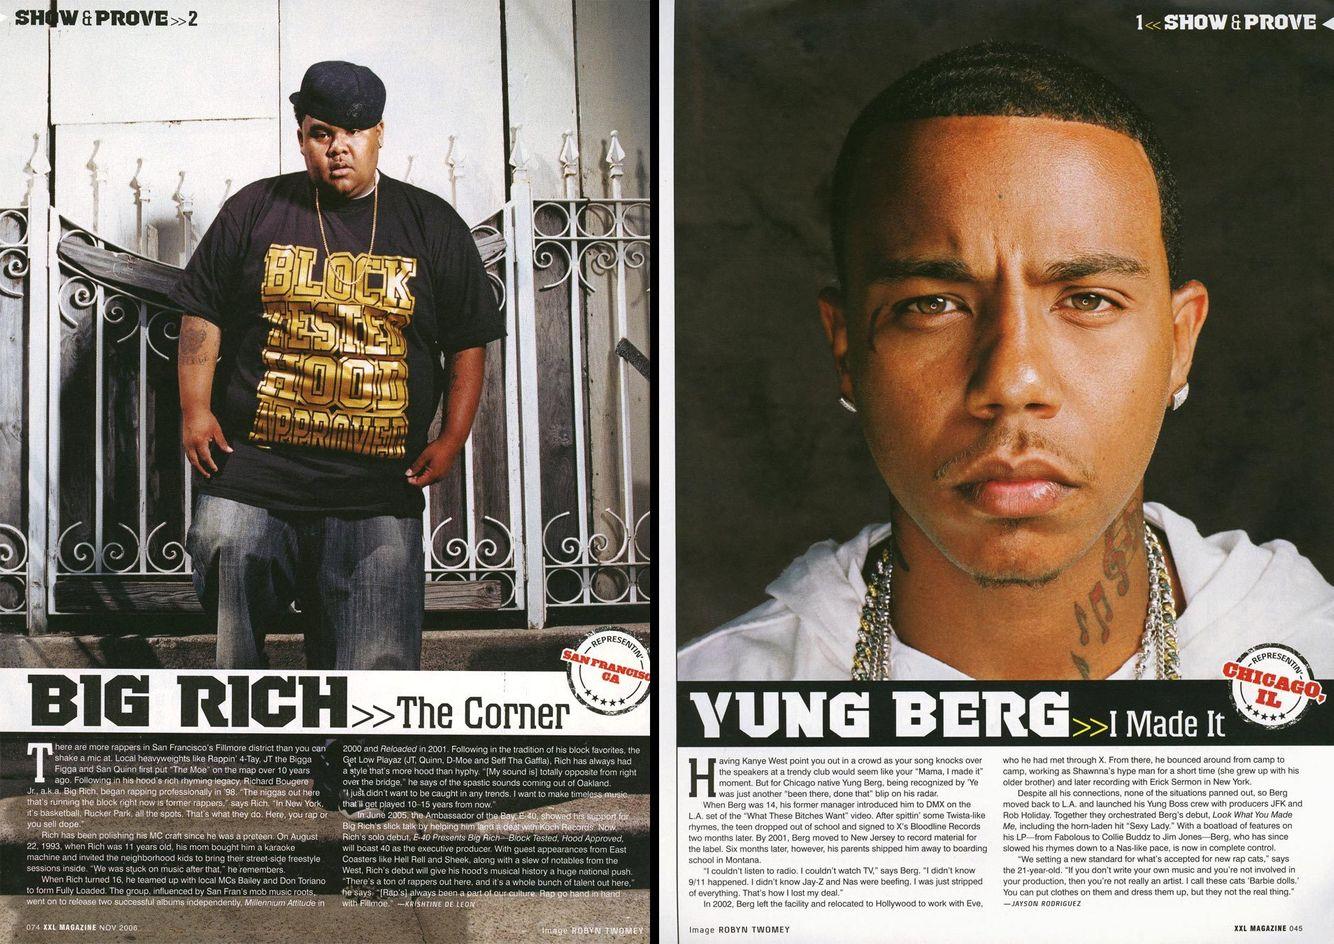 Big Rich, San Francisco, CA  /  Yung Berg, Los Angeles, CA